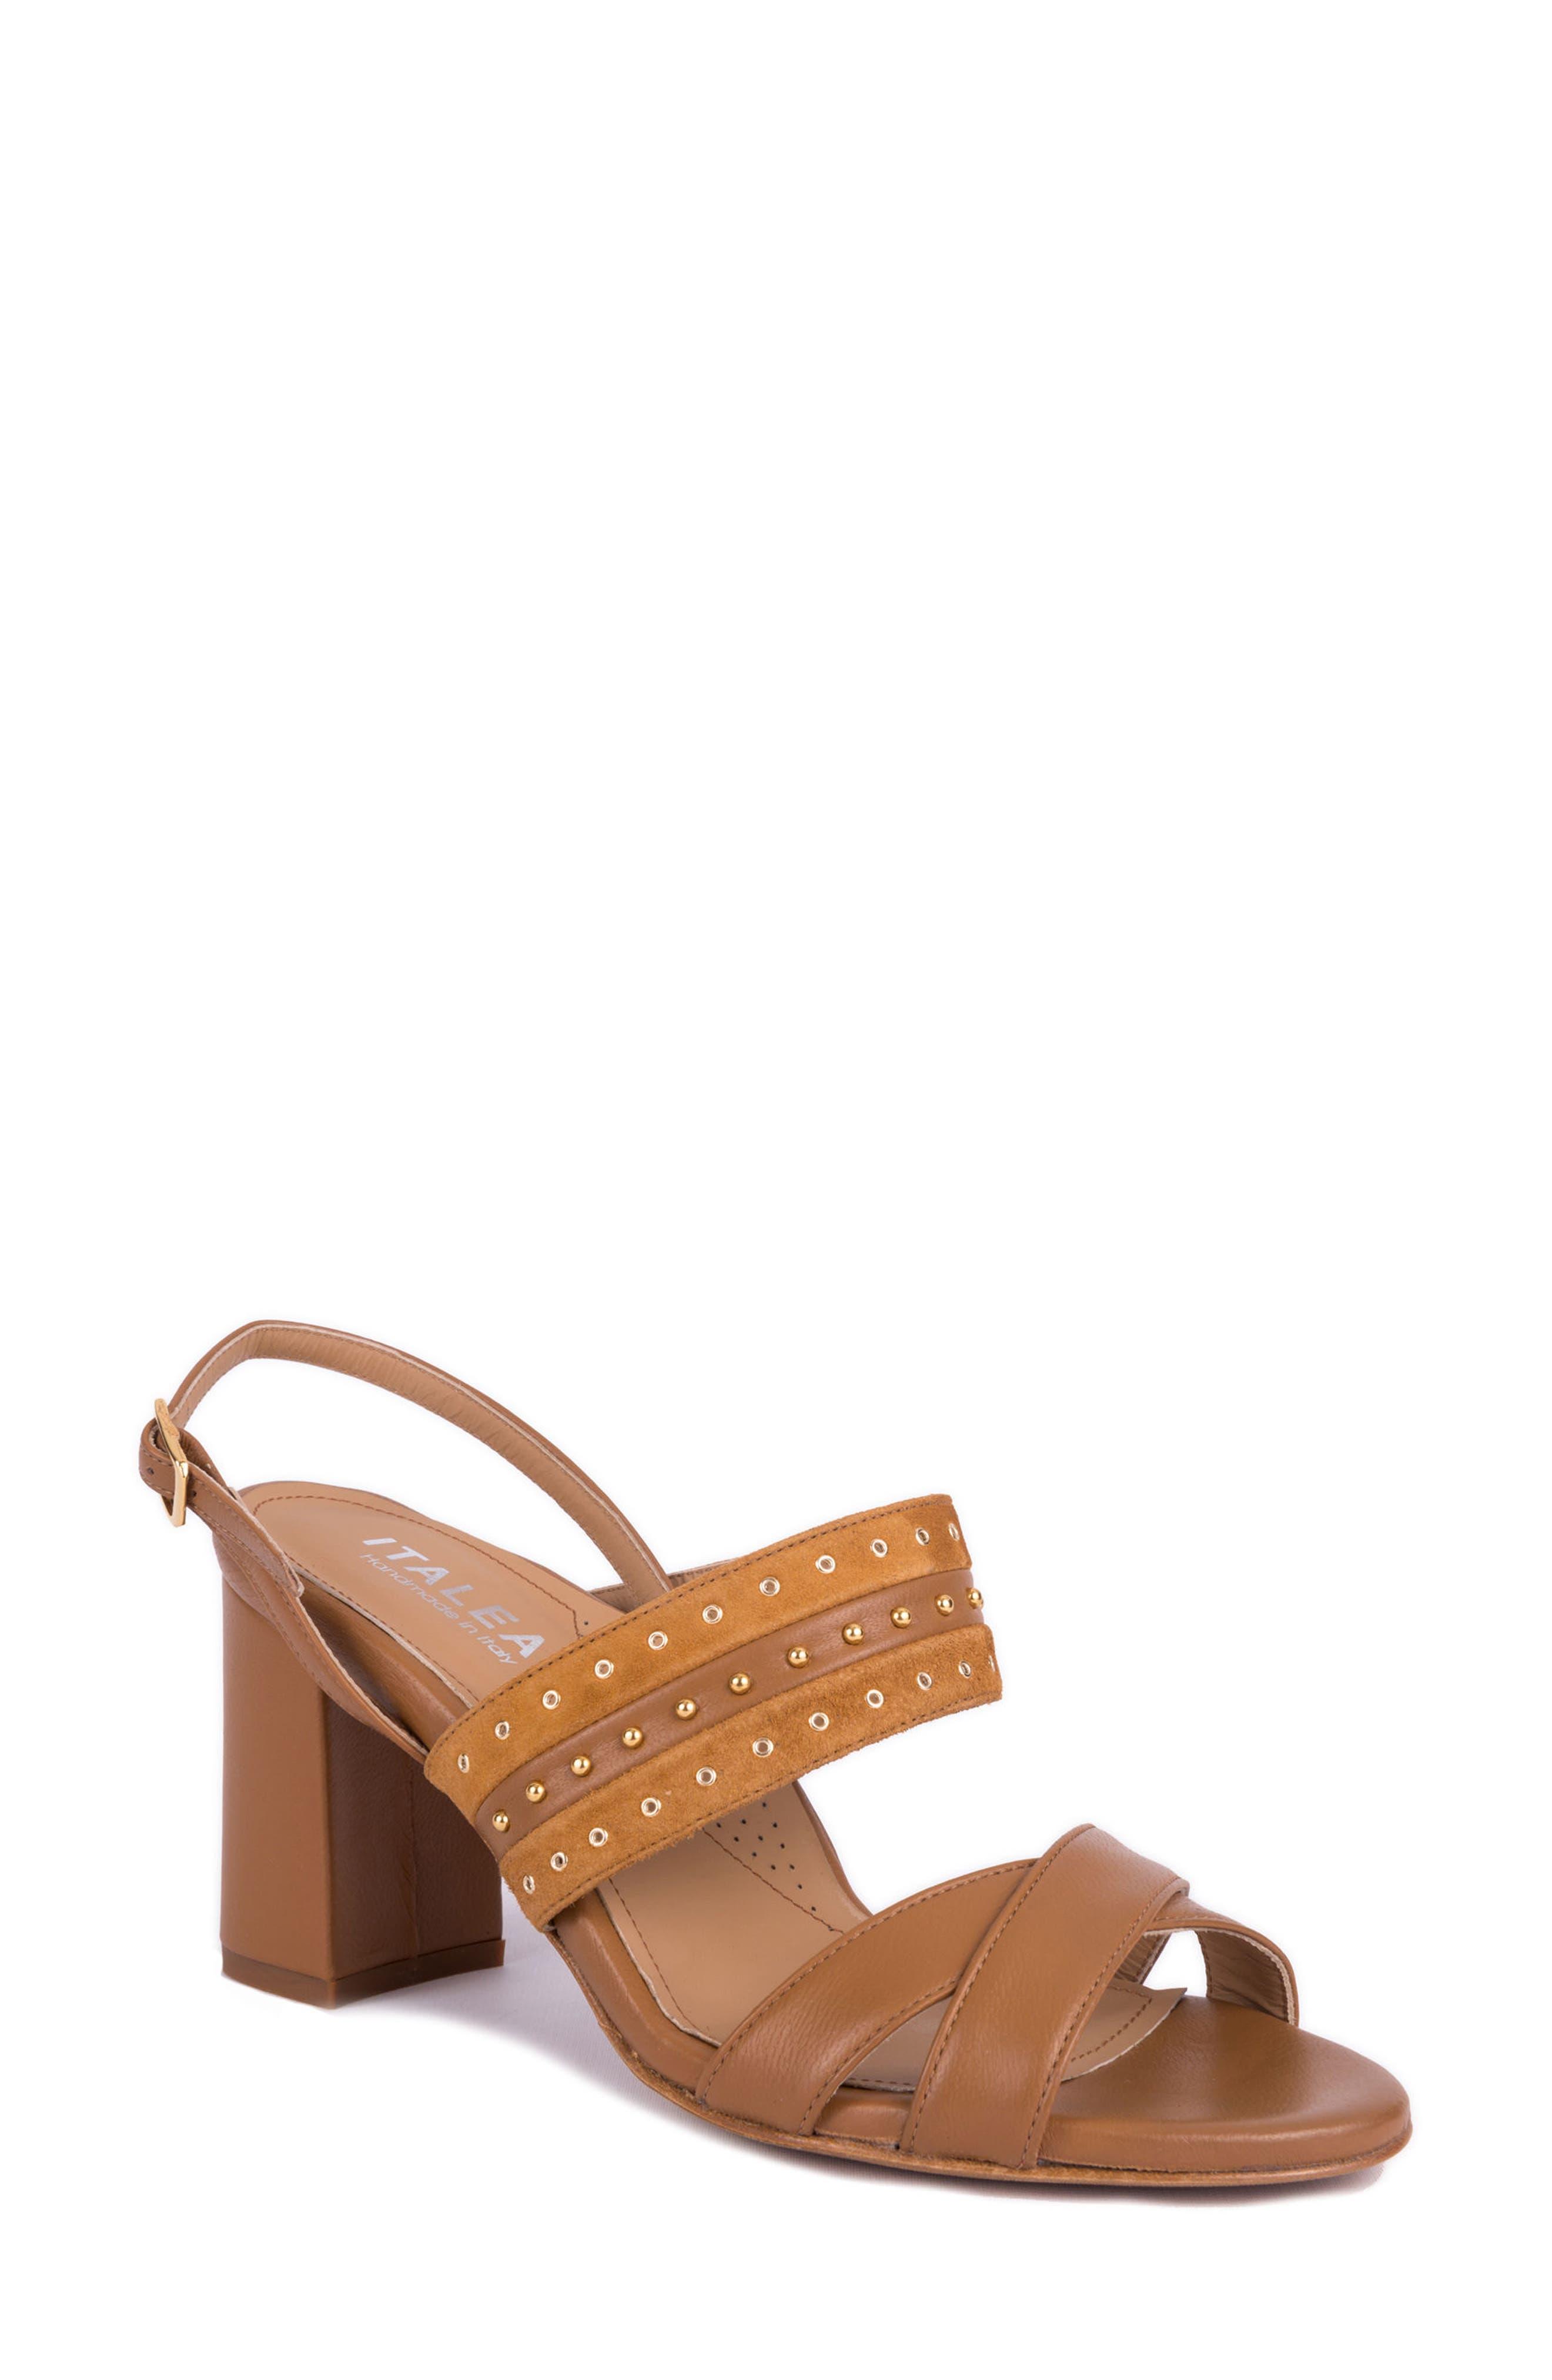 Soldani Studded Slingback Sandal,                         Main,                         color,